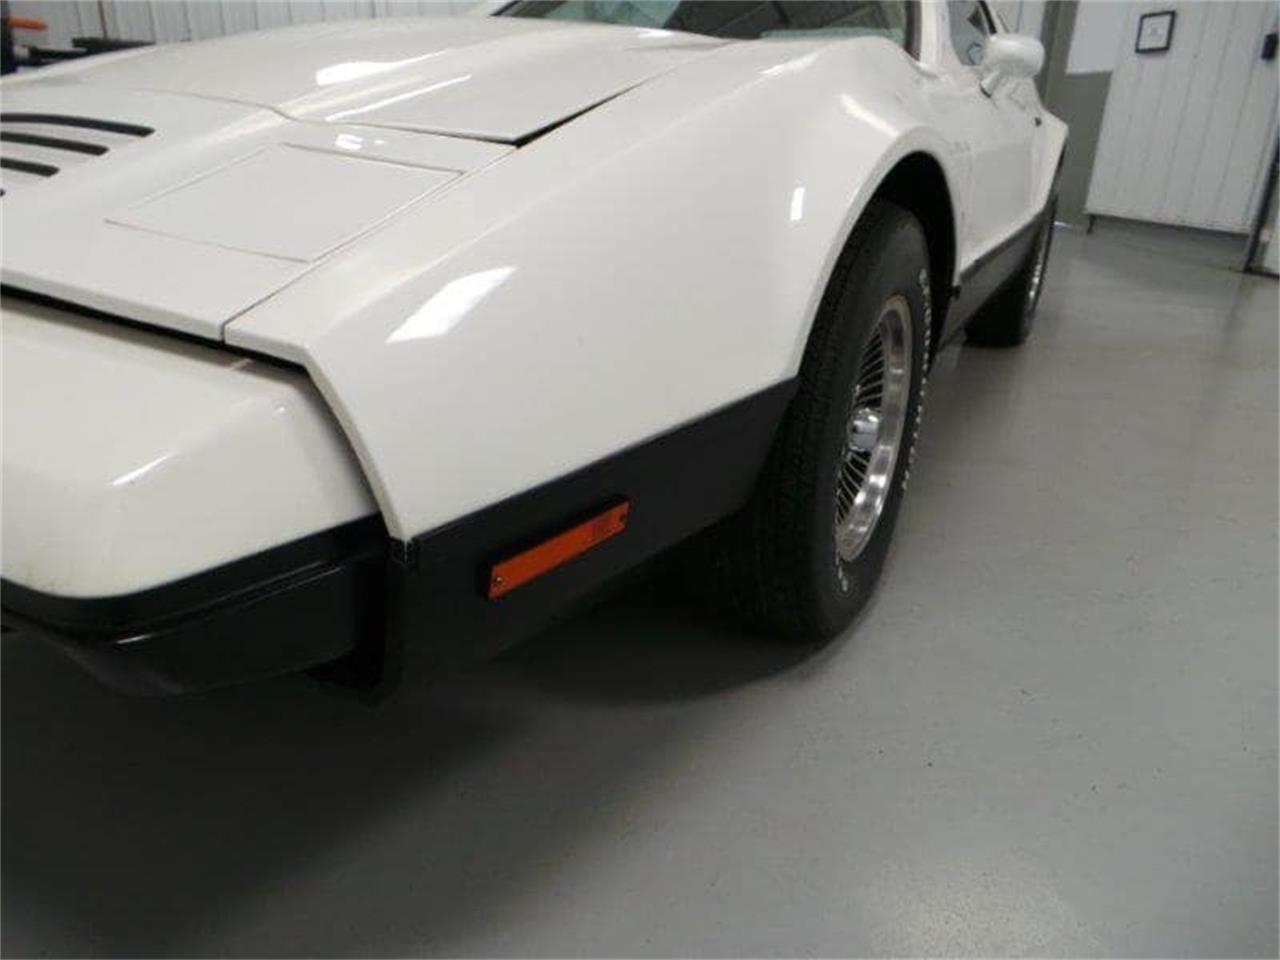 Large Picture of 1975 Bricklin SV 1 located in Virginia - $26,700.00 - JLA1